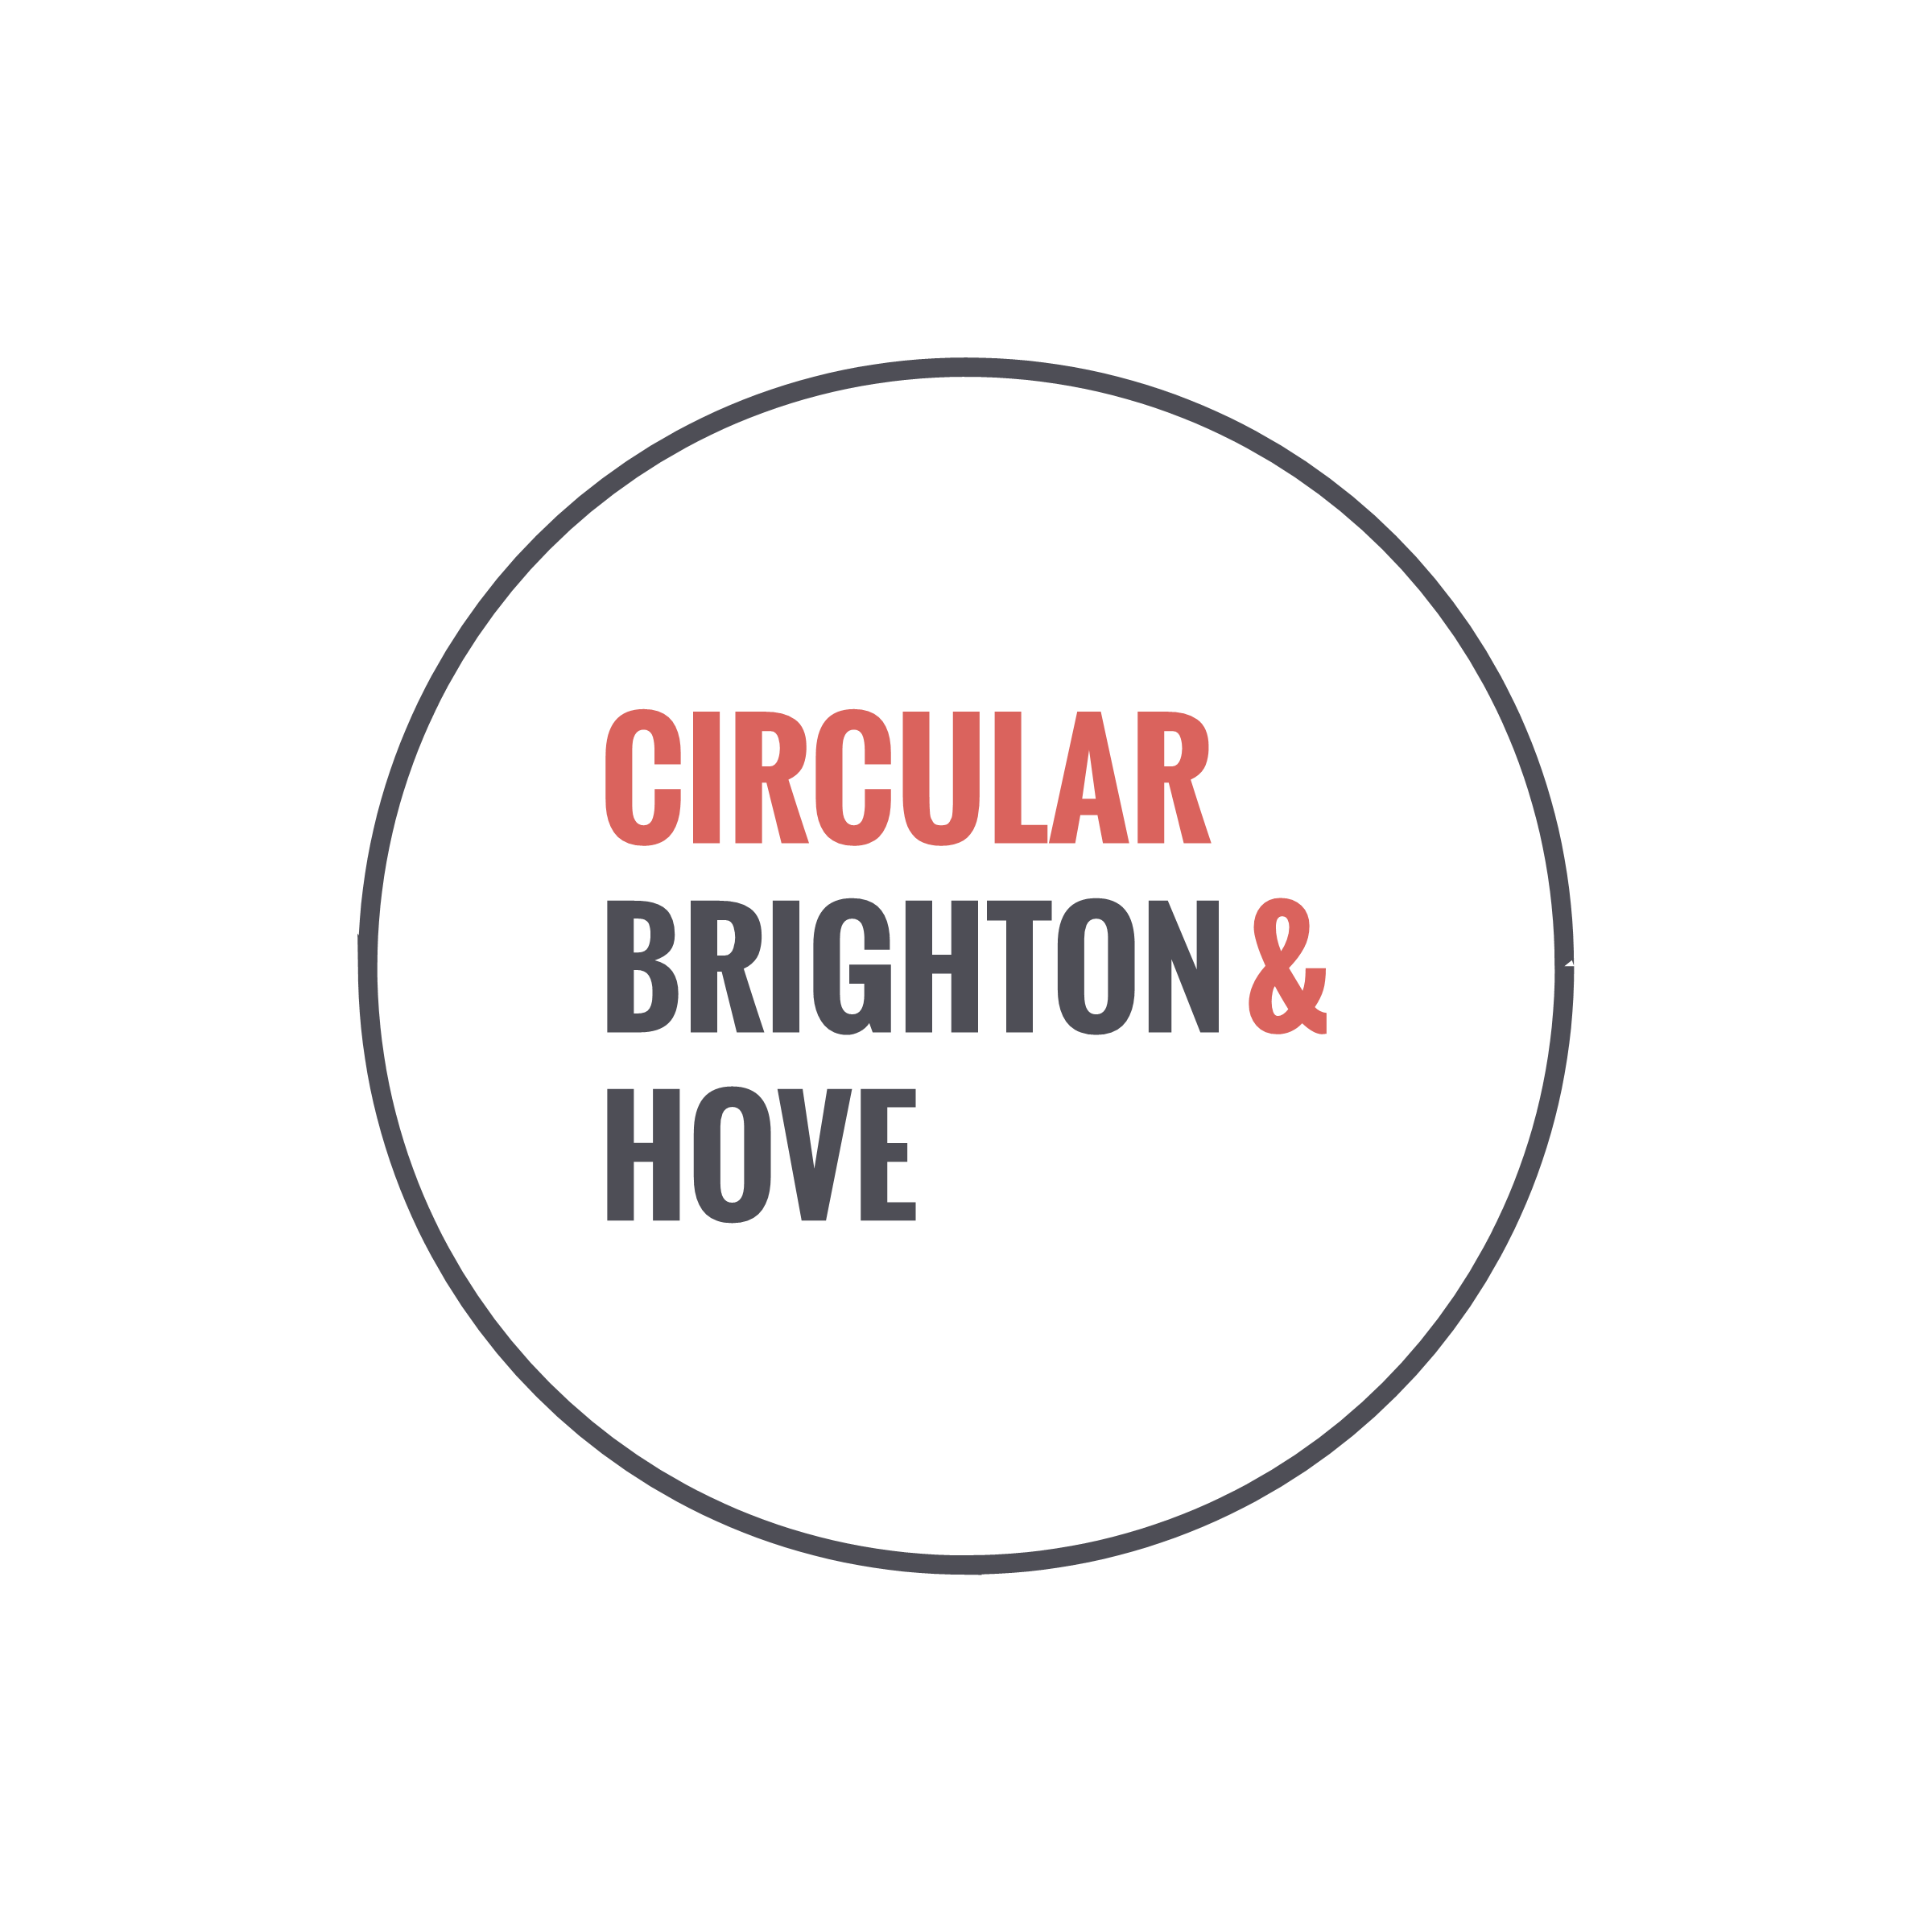 Circular Brighton & Hove logo